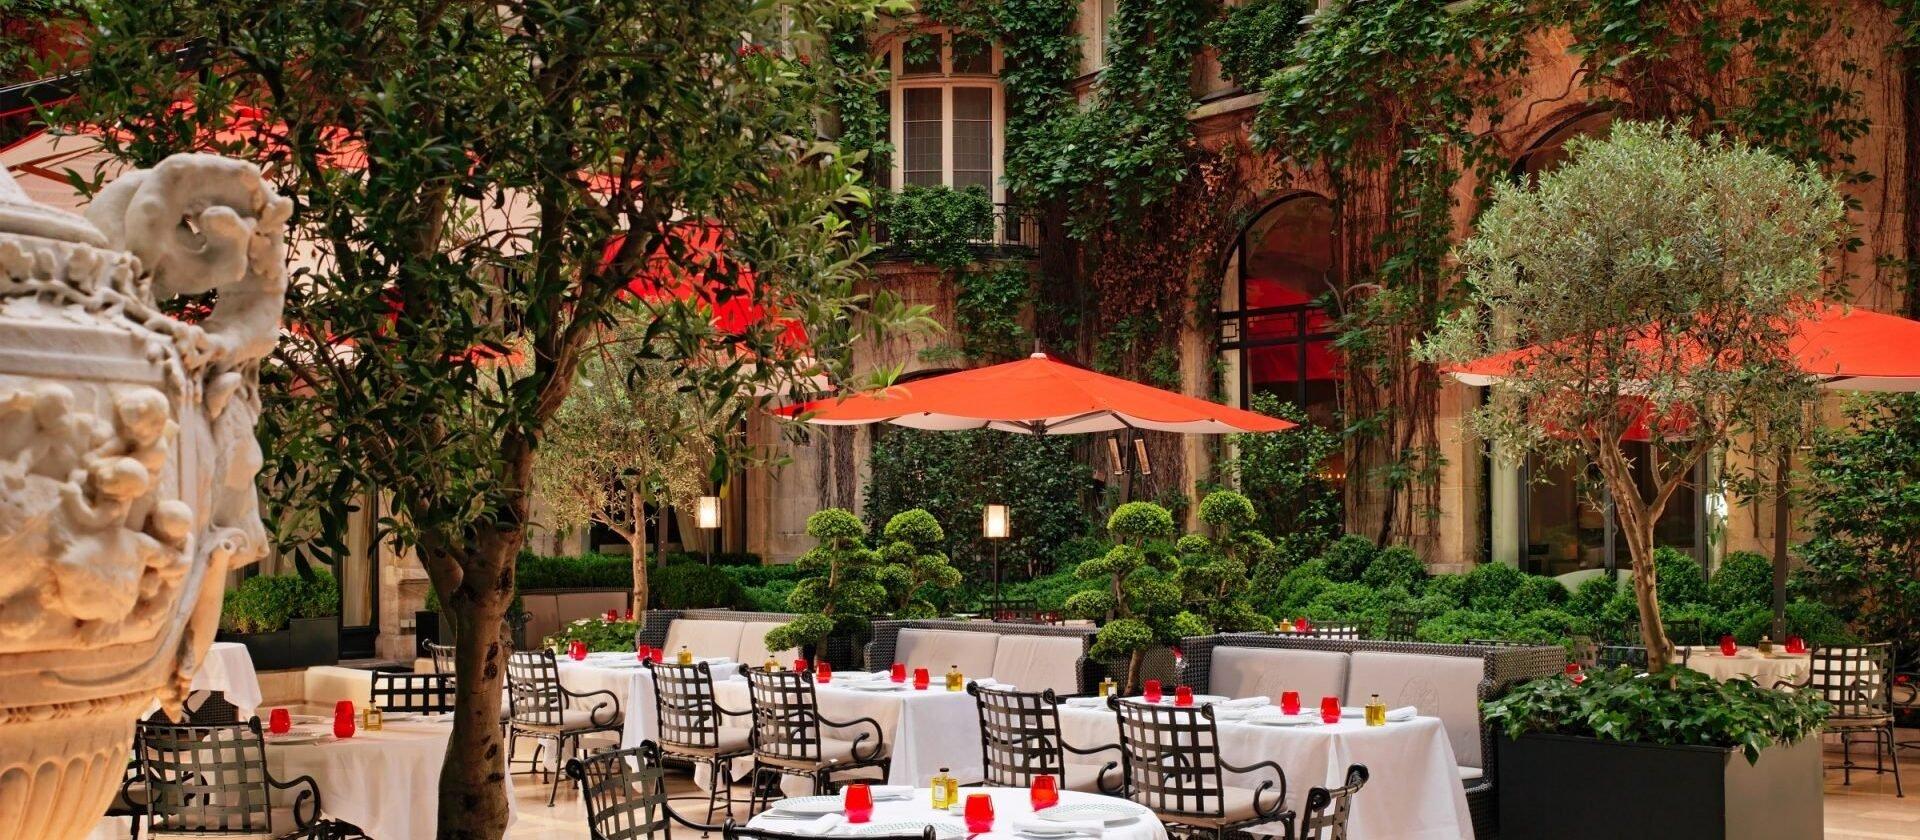 hotel plaza ath n e 5 star luxury hotel dorchester. Black Bedroom Furniture Sets. Home Design Ideas